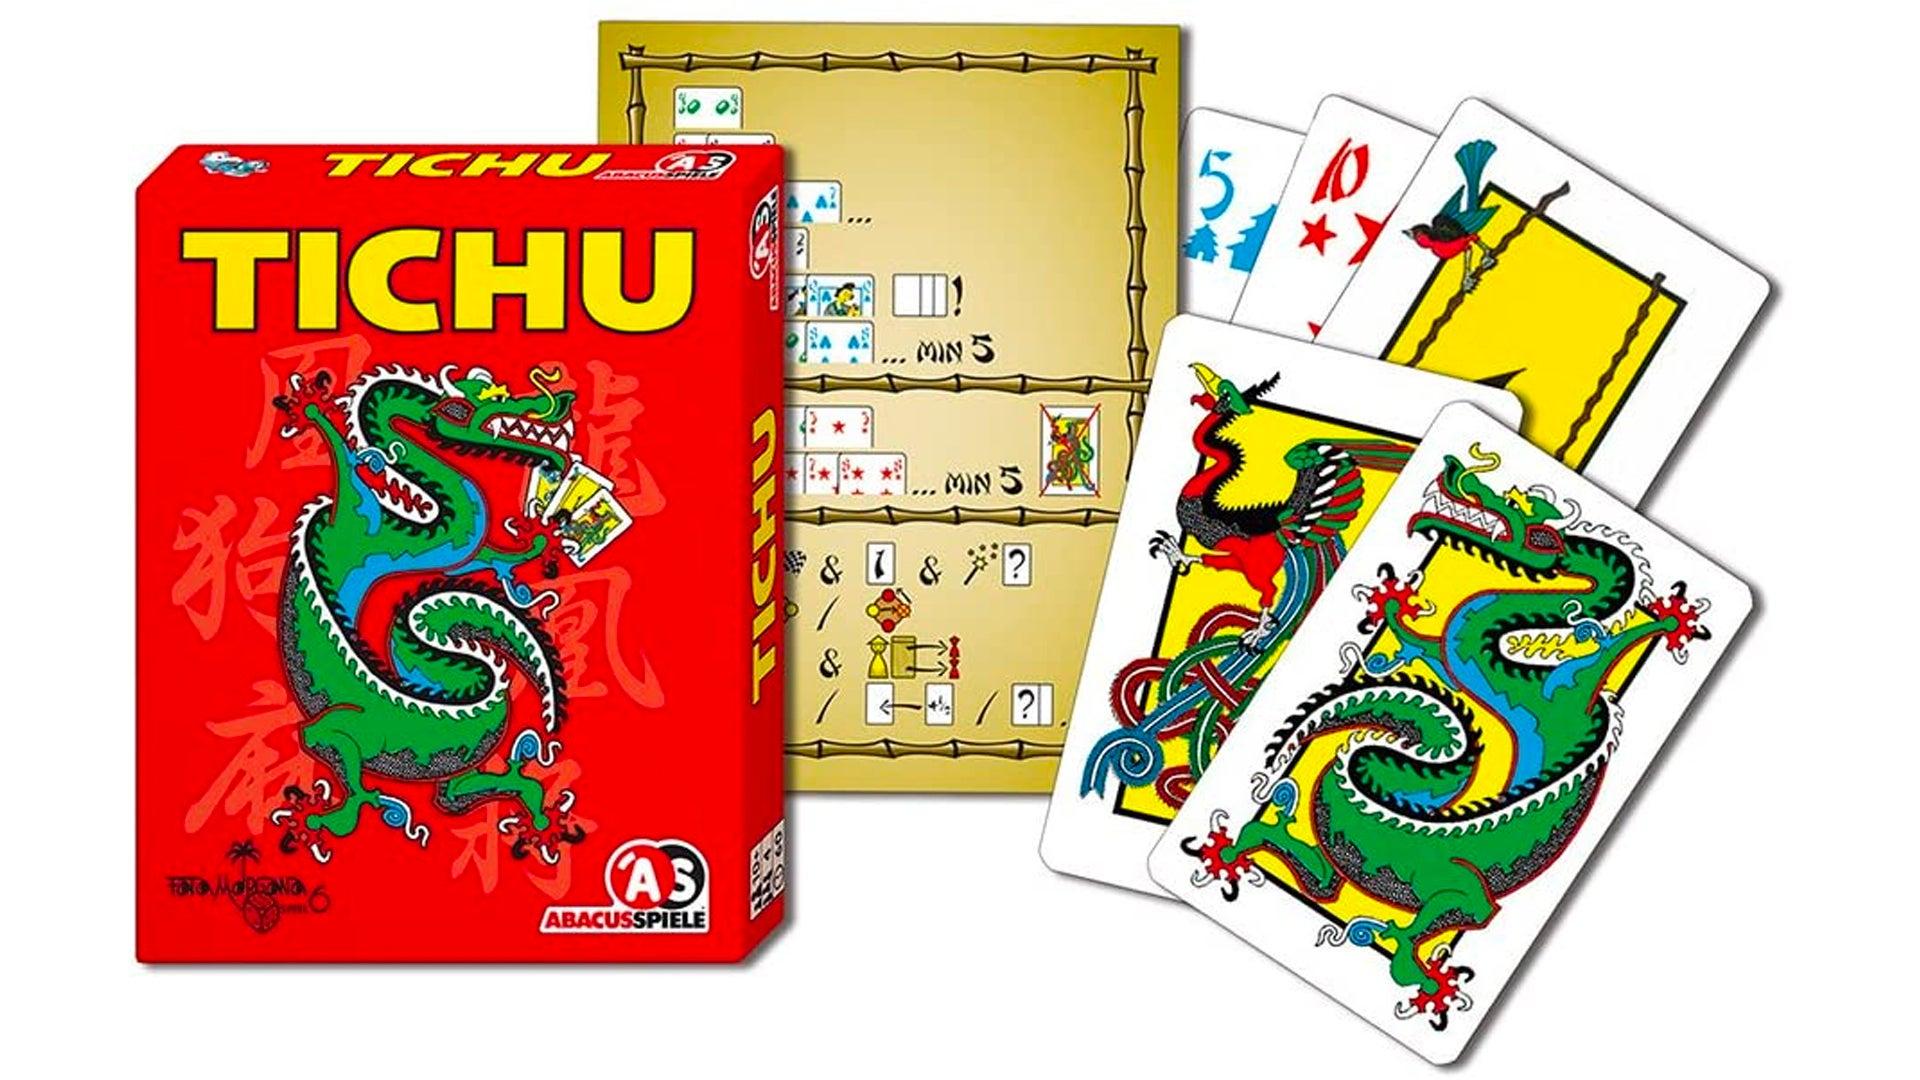 tichu-board-game-box-contents.jpg